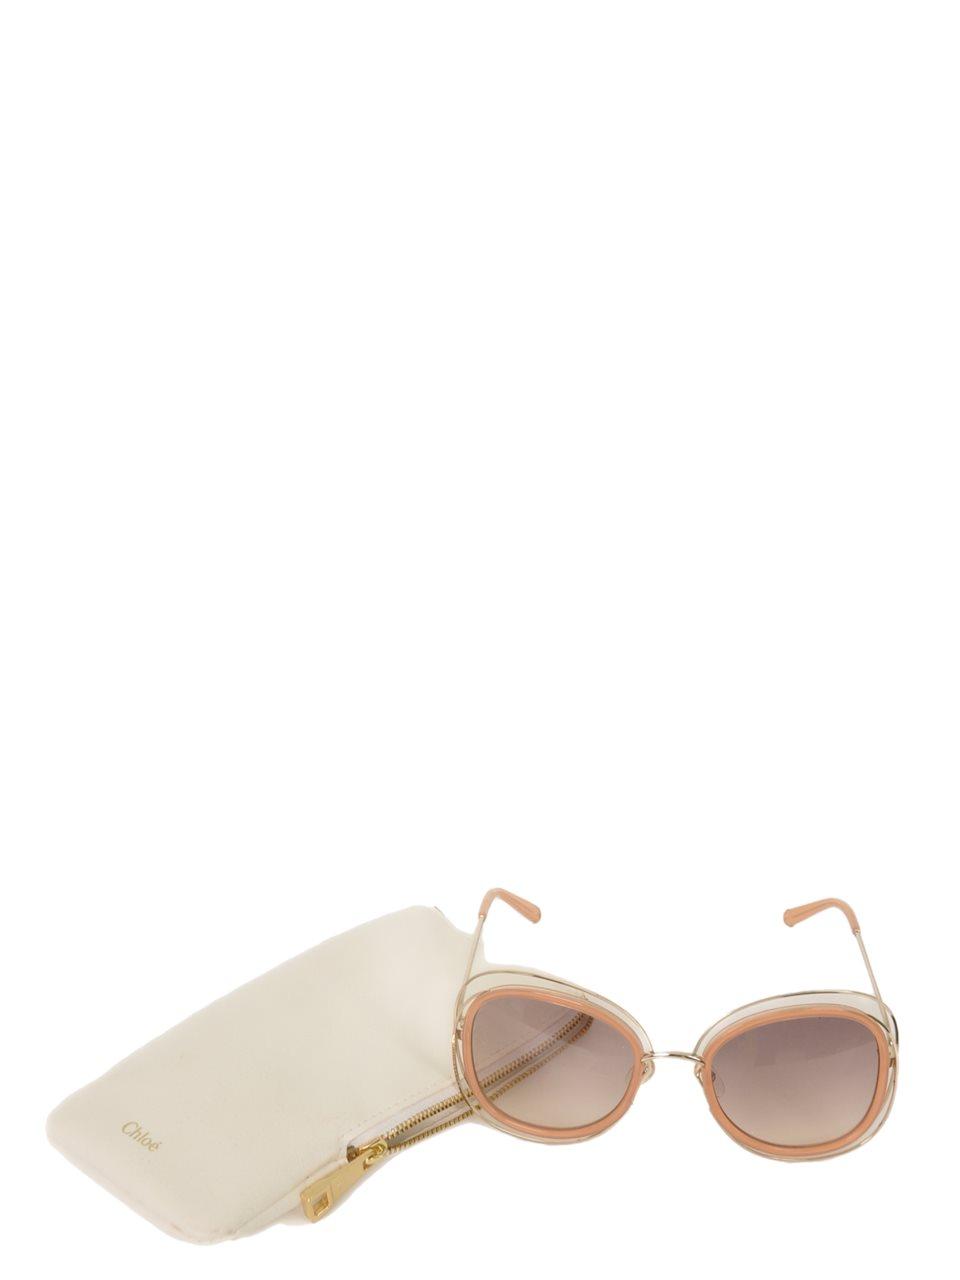 Chloe - Sunglasses - Image 3 of 5